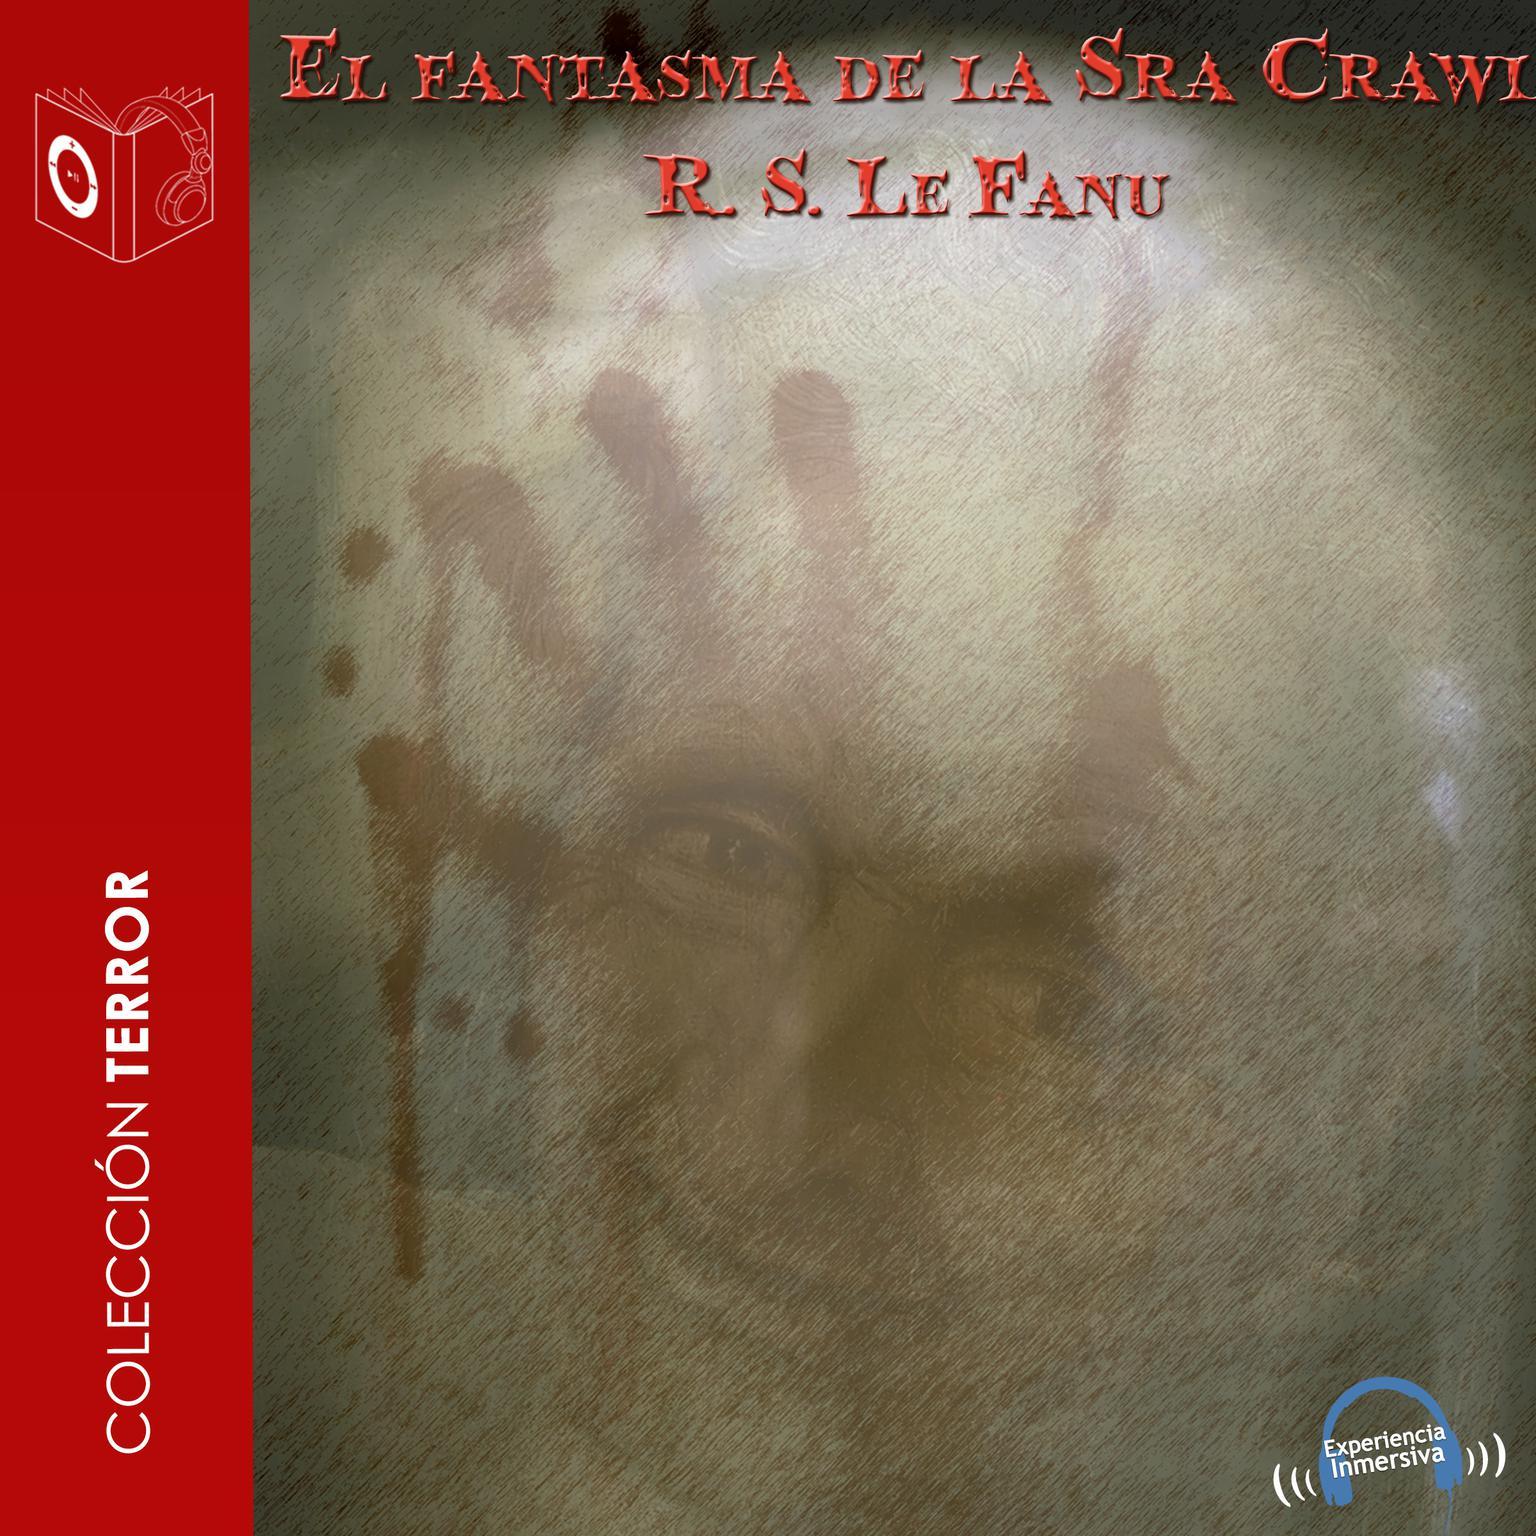 El fantasma de la Sra. Crowl Audiobook, by Joseph Sheridan Le Fanu